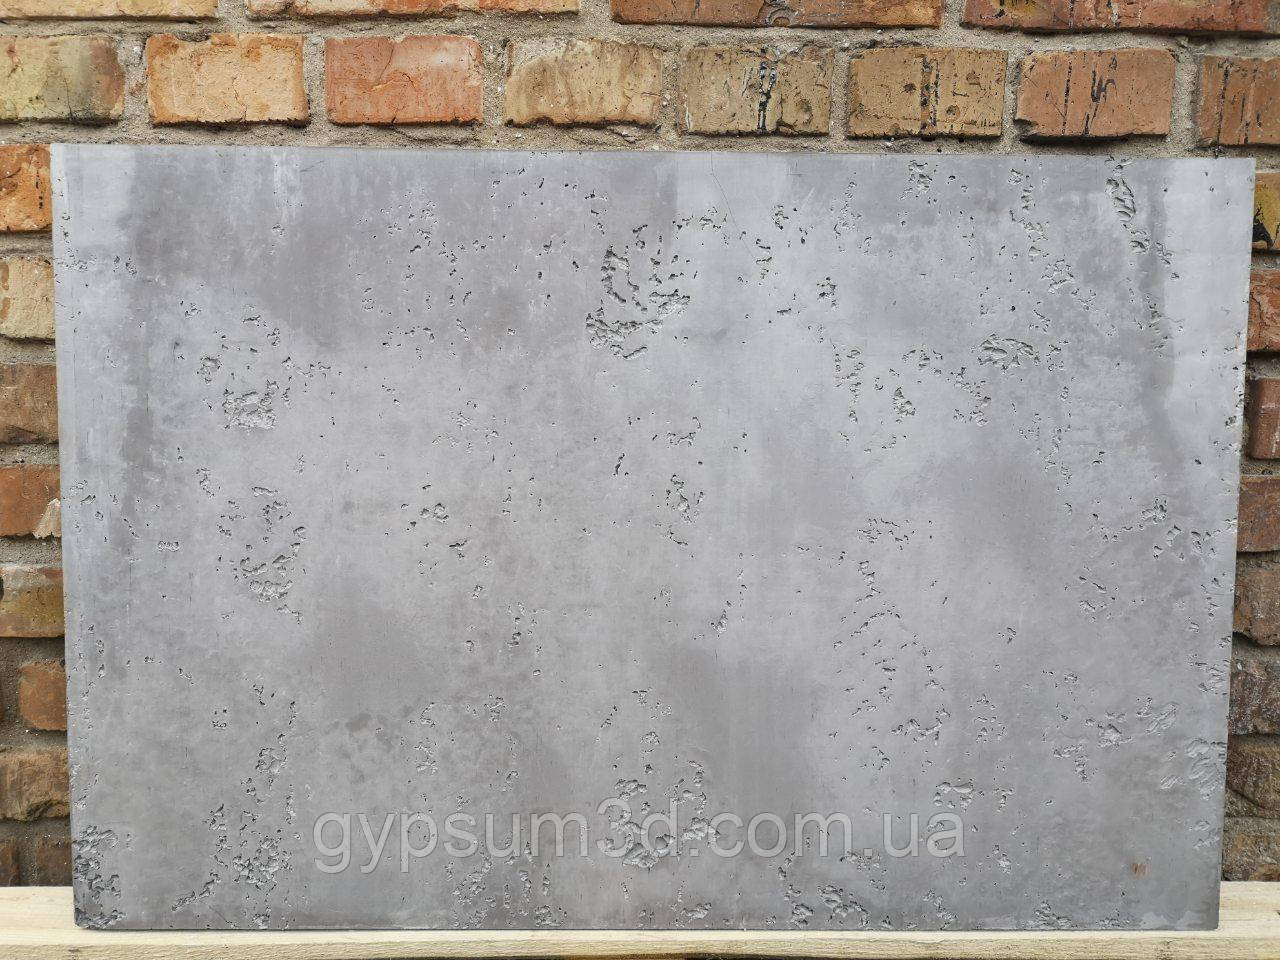 Бетон ua смеси бетонные тяжелые марка